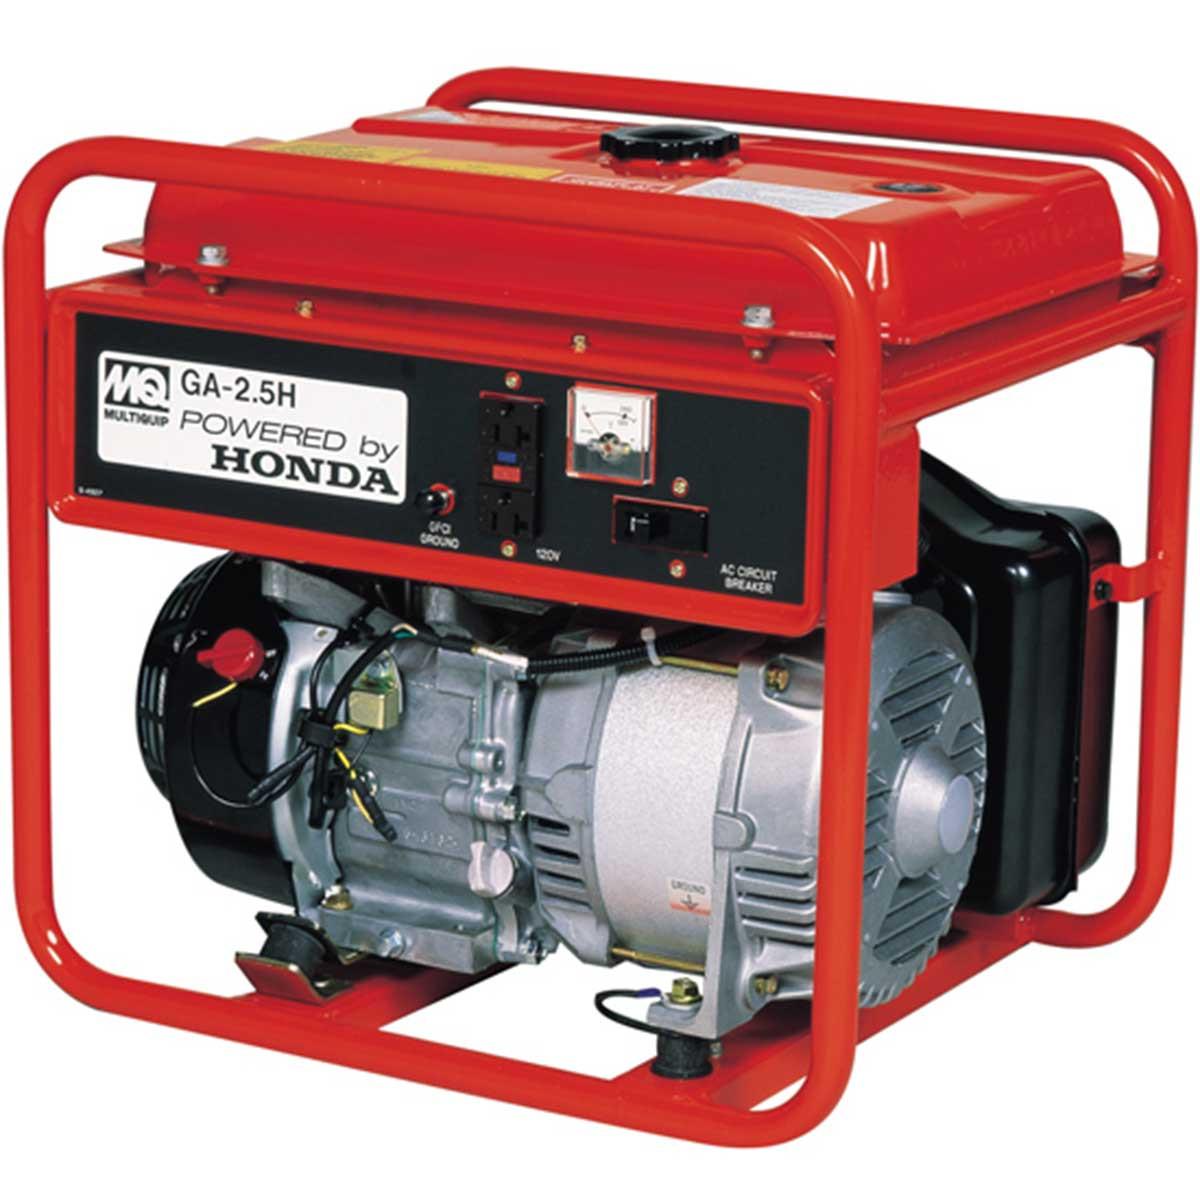 multiquip 5.5hp portable generator 2500 watt